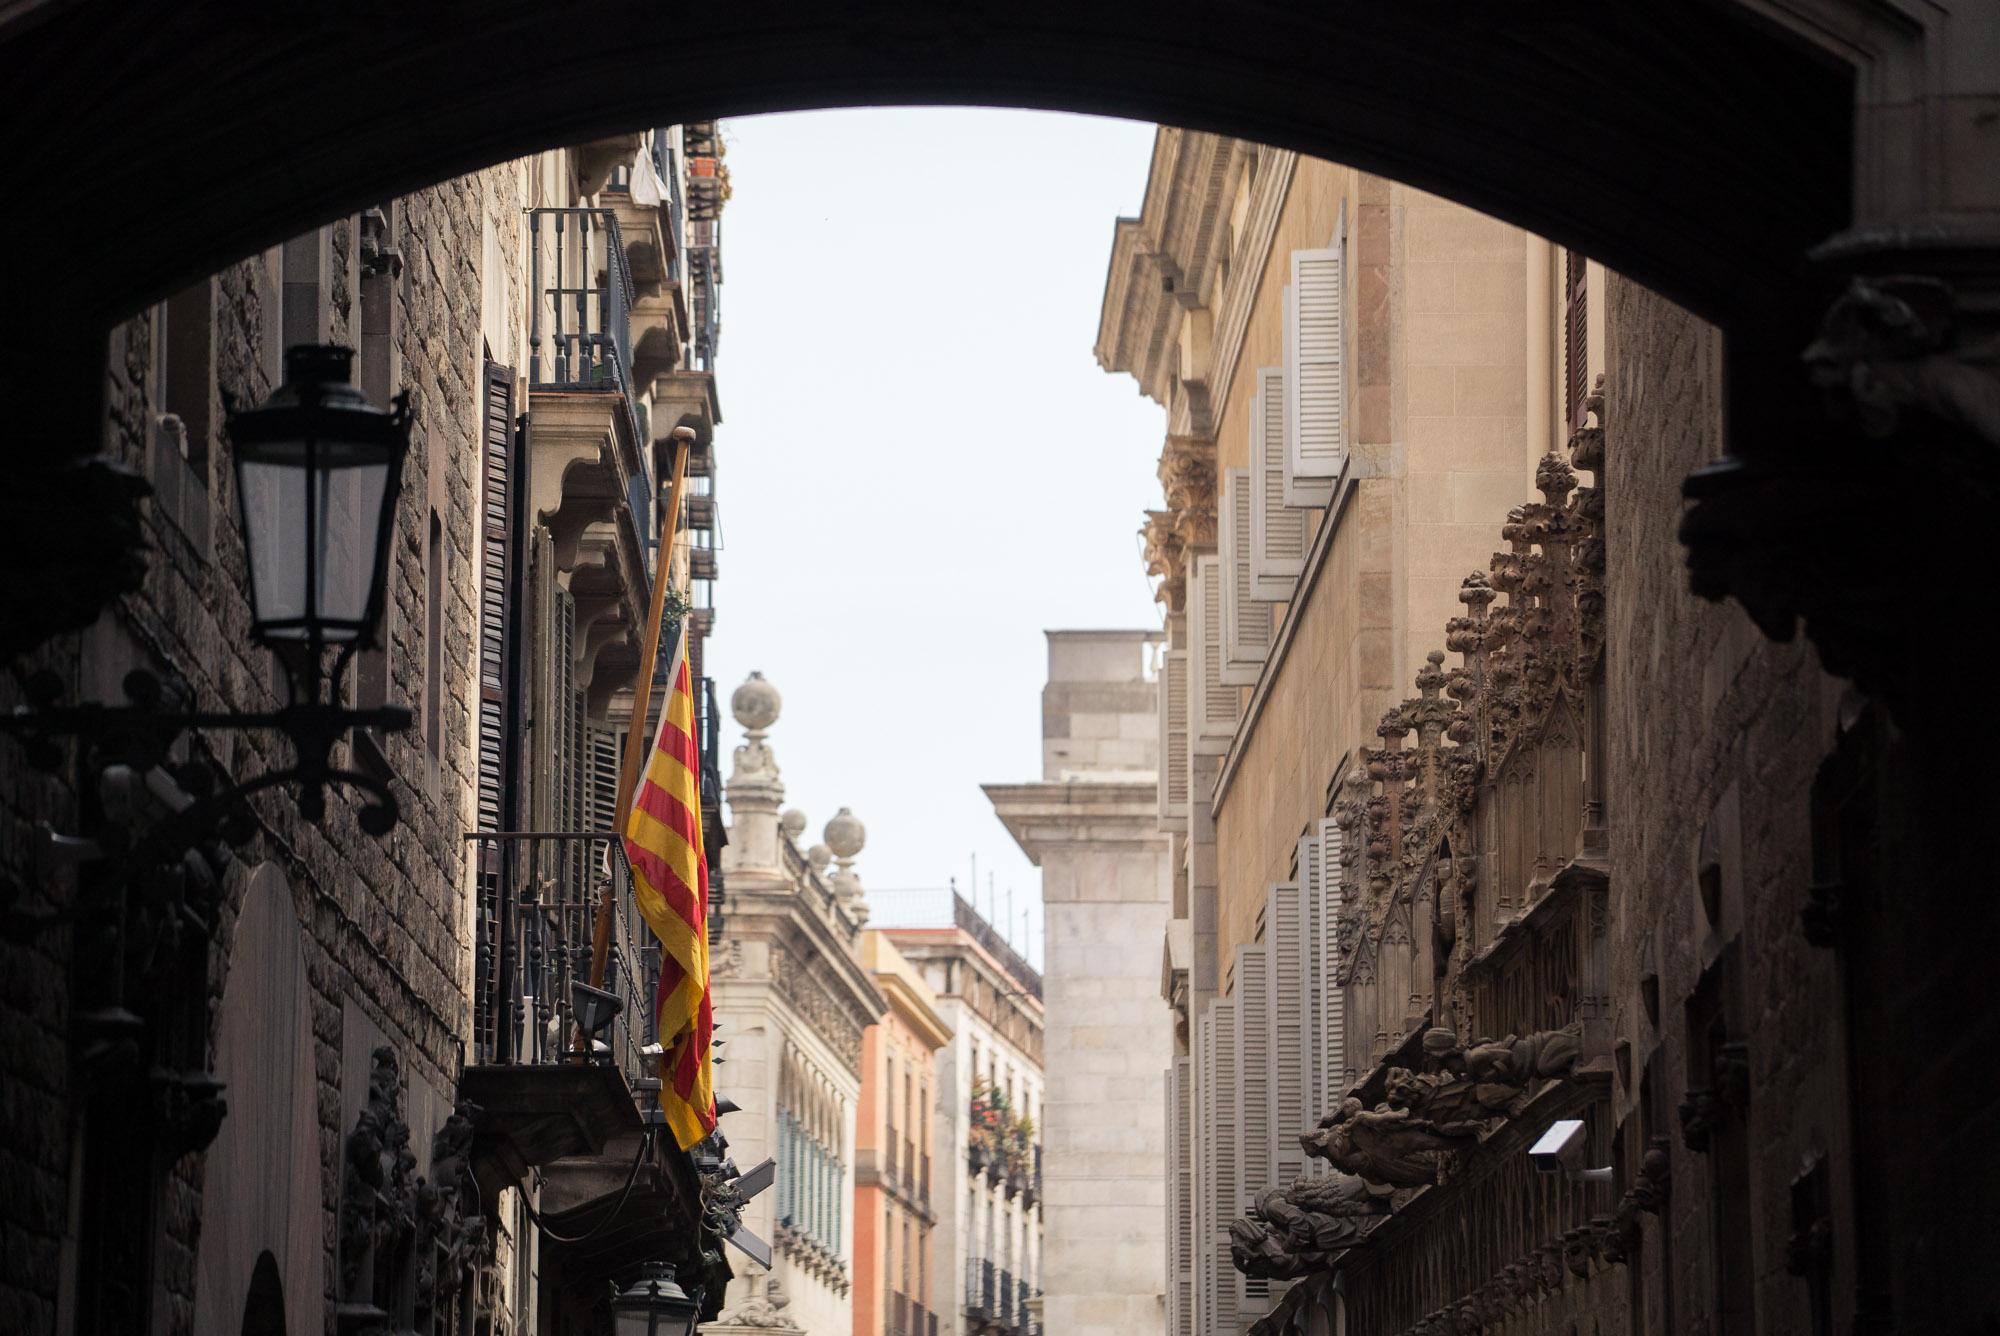 barcelona_0052